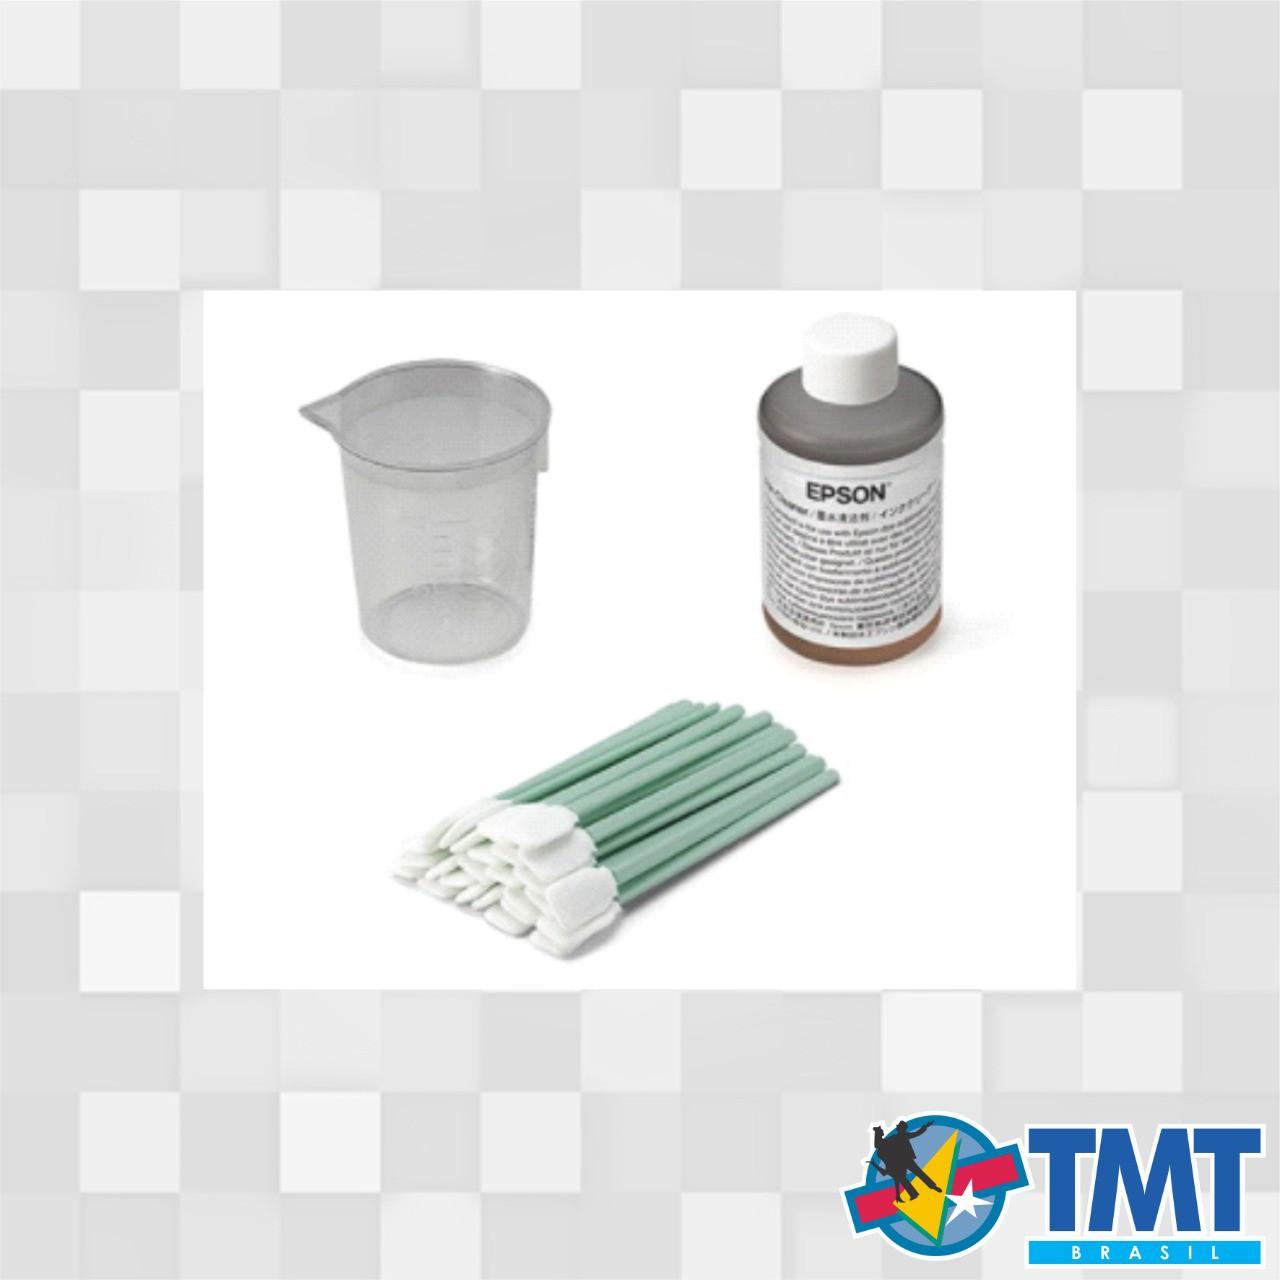 Kit de Manutenção F9370 - C13S210063